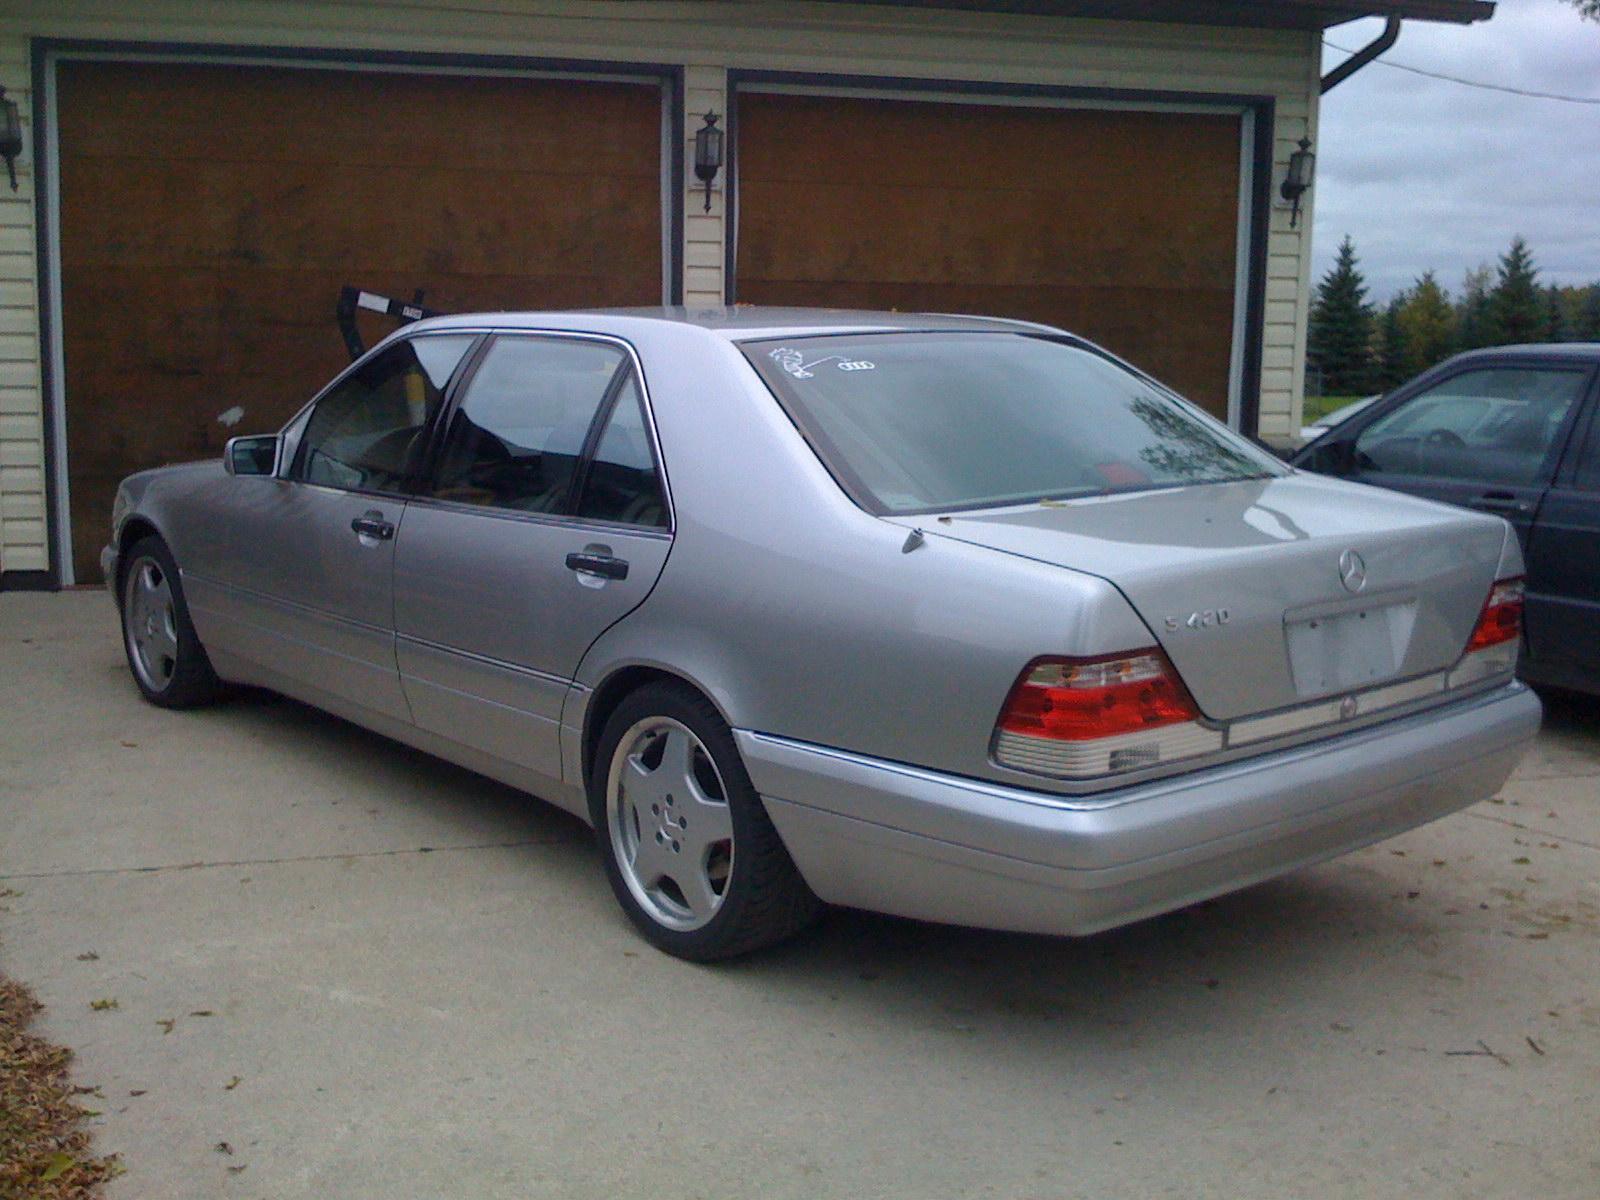 Mercedes benz s 420 photos reviews news specs buy car for Mercedes benz s 420